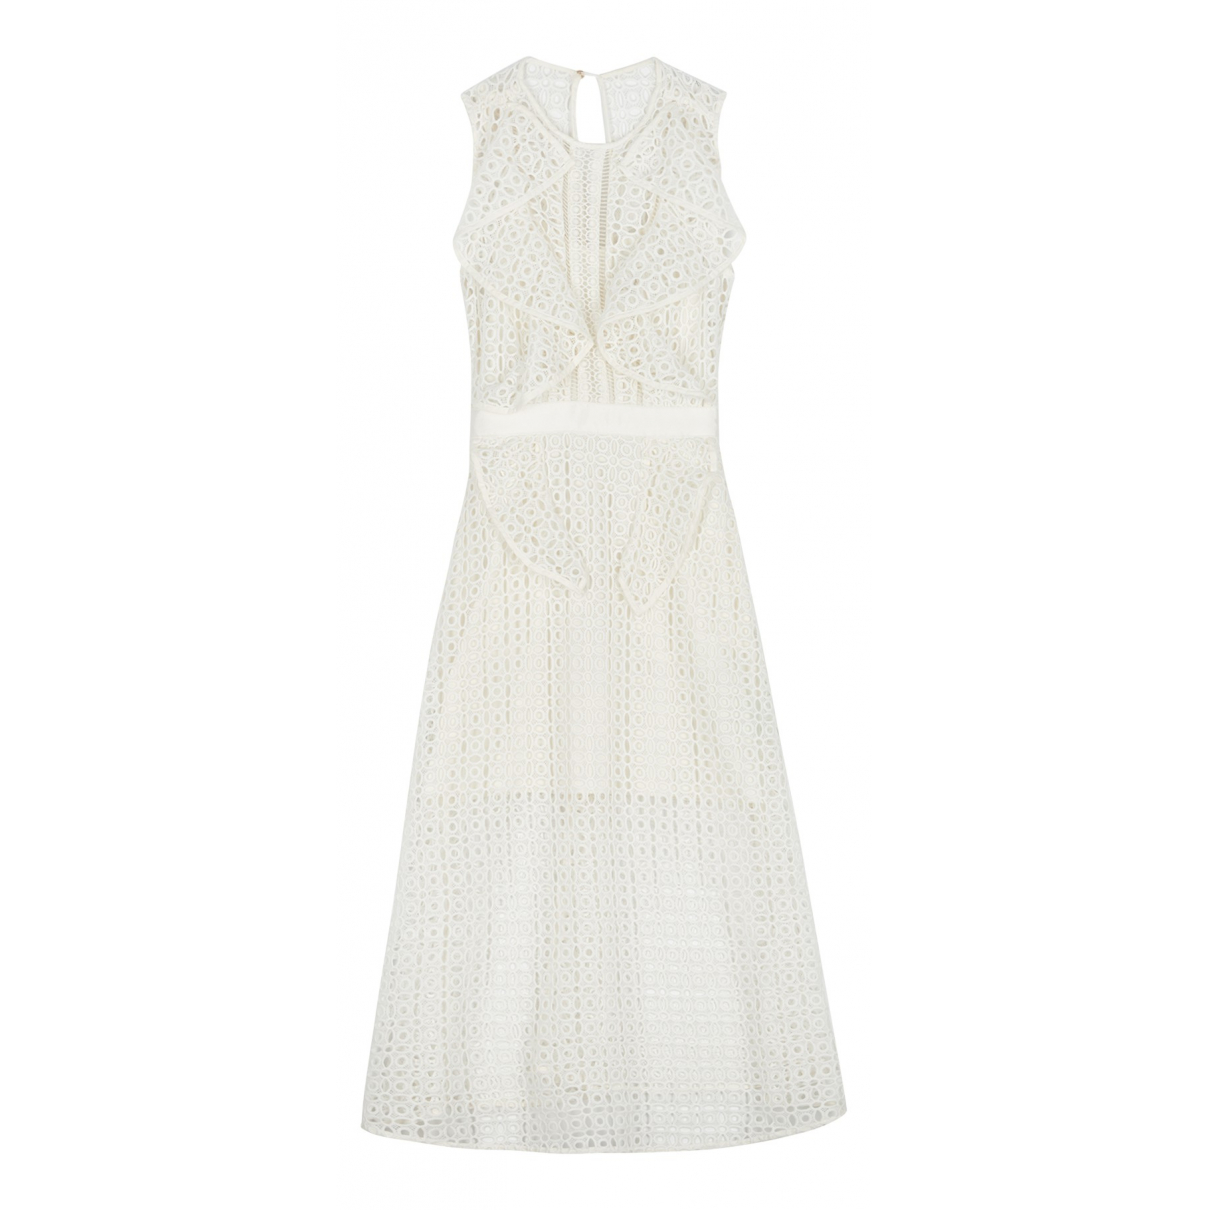 Self Portrait N White Cotton dress for Women 6 UK